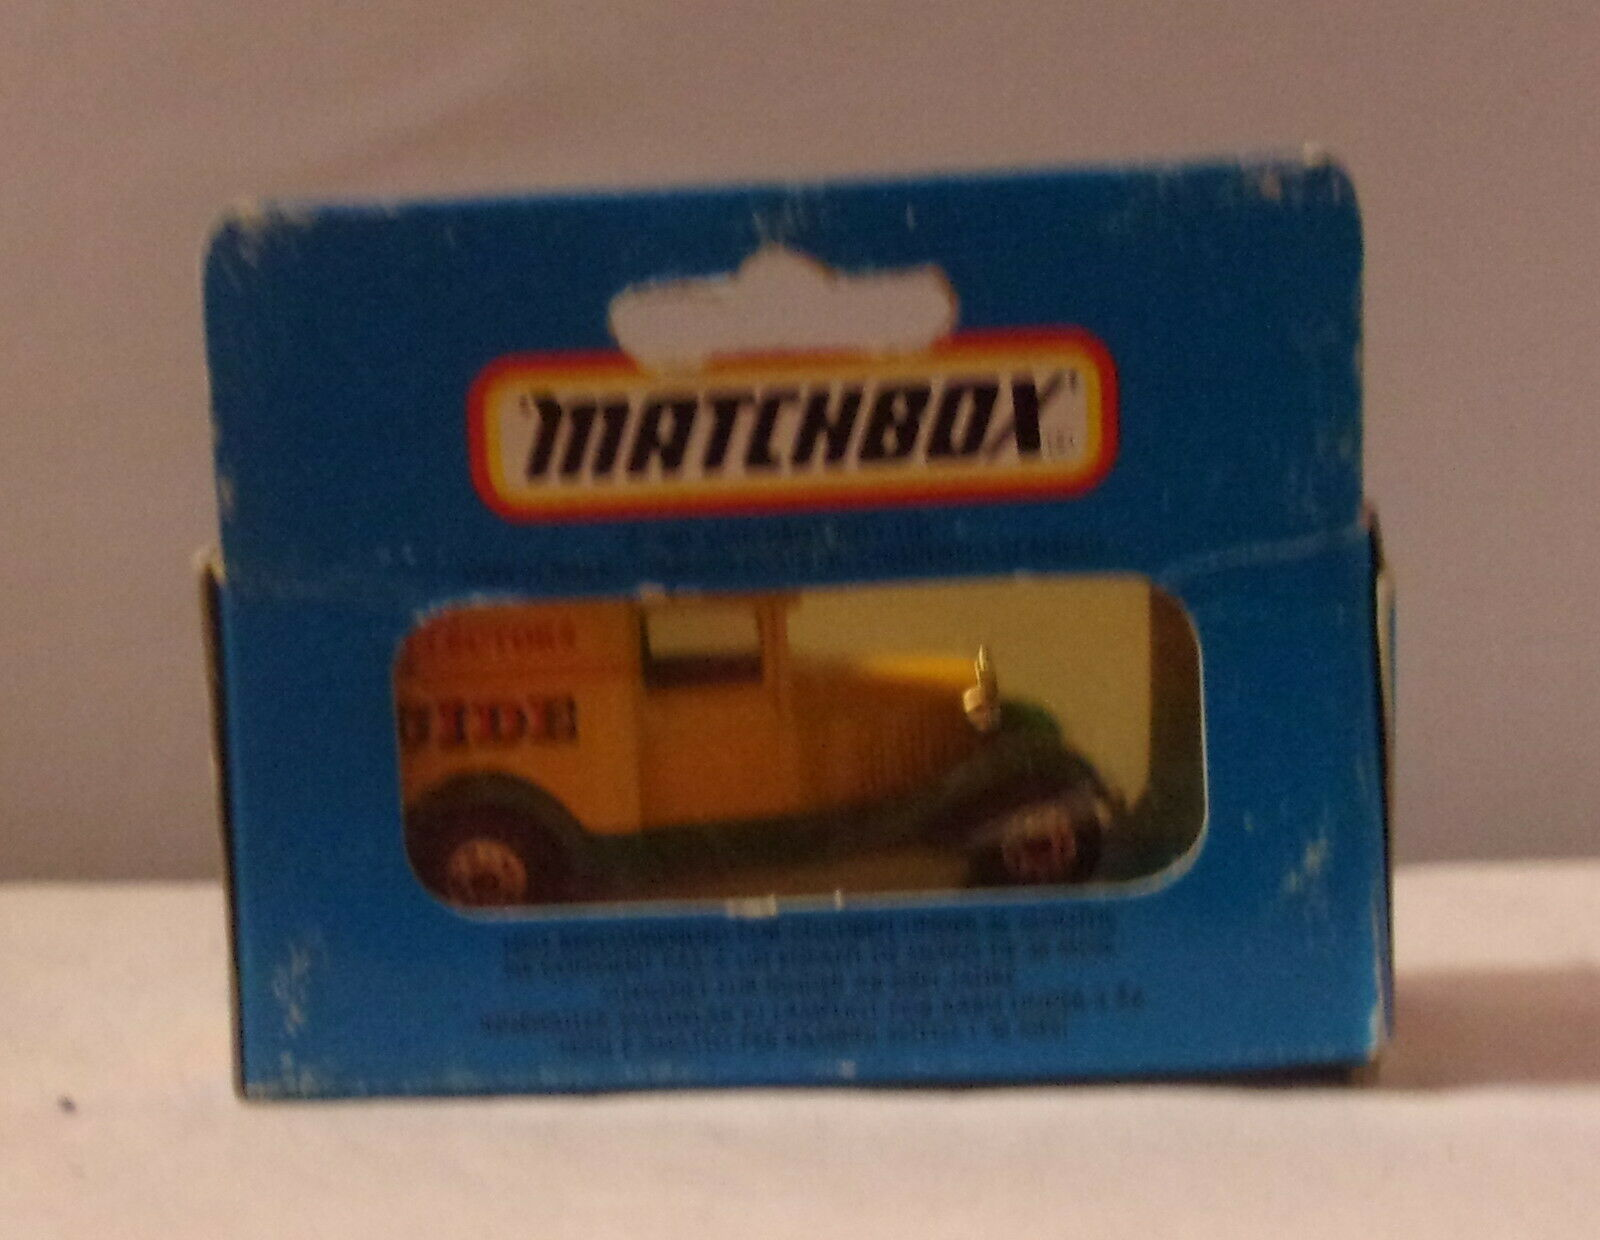 No:38 Matchbox Ford Model A Van Rountrees Jellies Reproduction Box